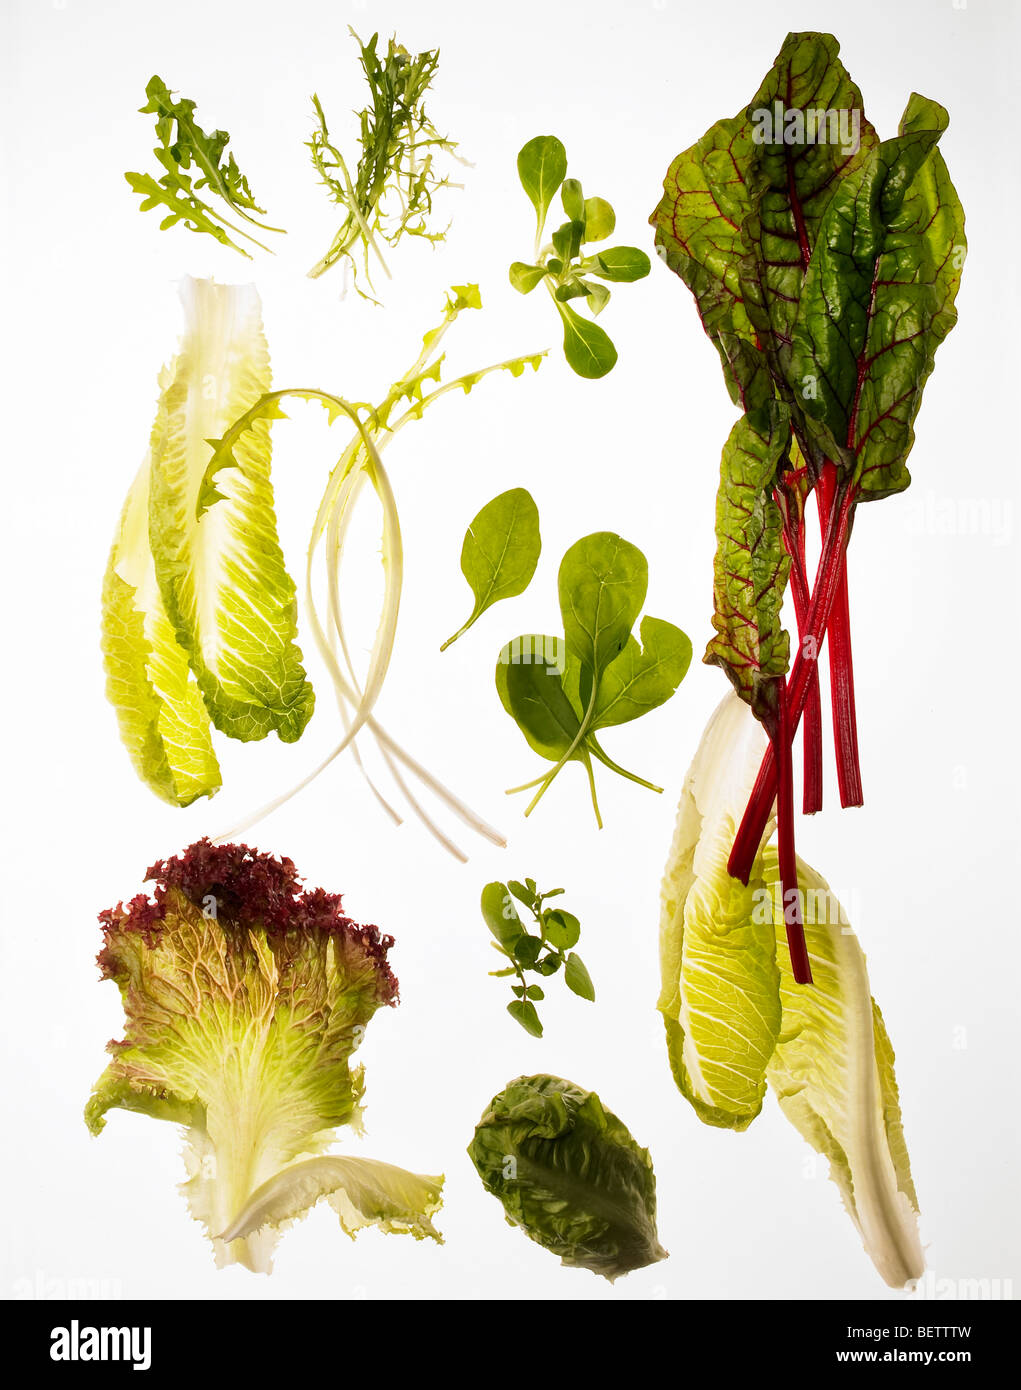 Salatzutaten, verschiedene grüne Blätter für Salate geeignet. Stockbild